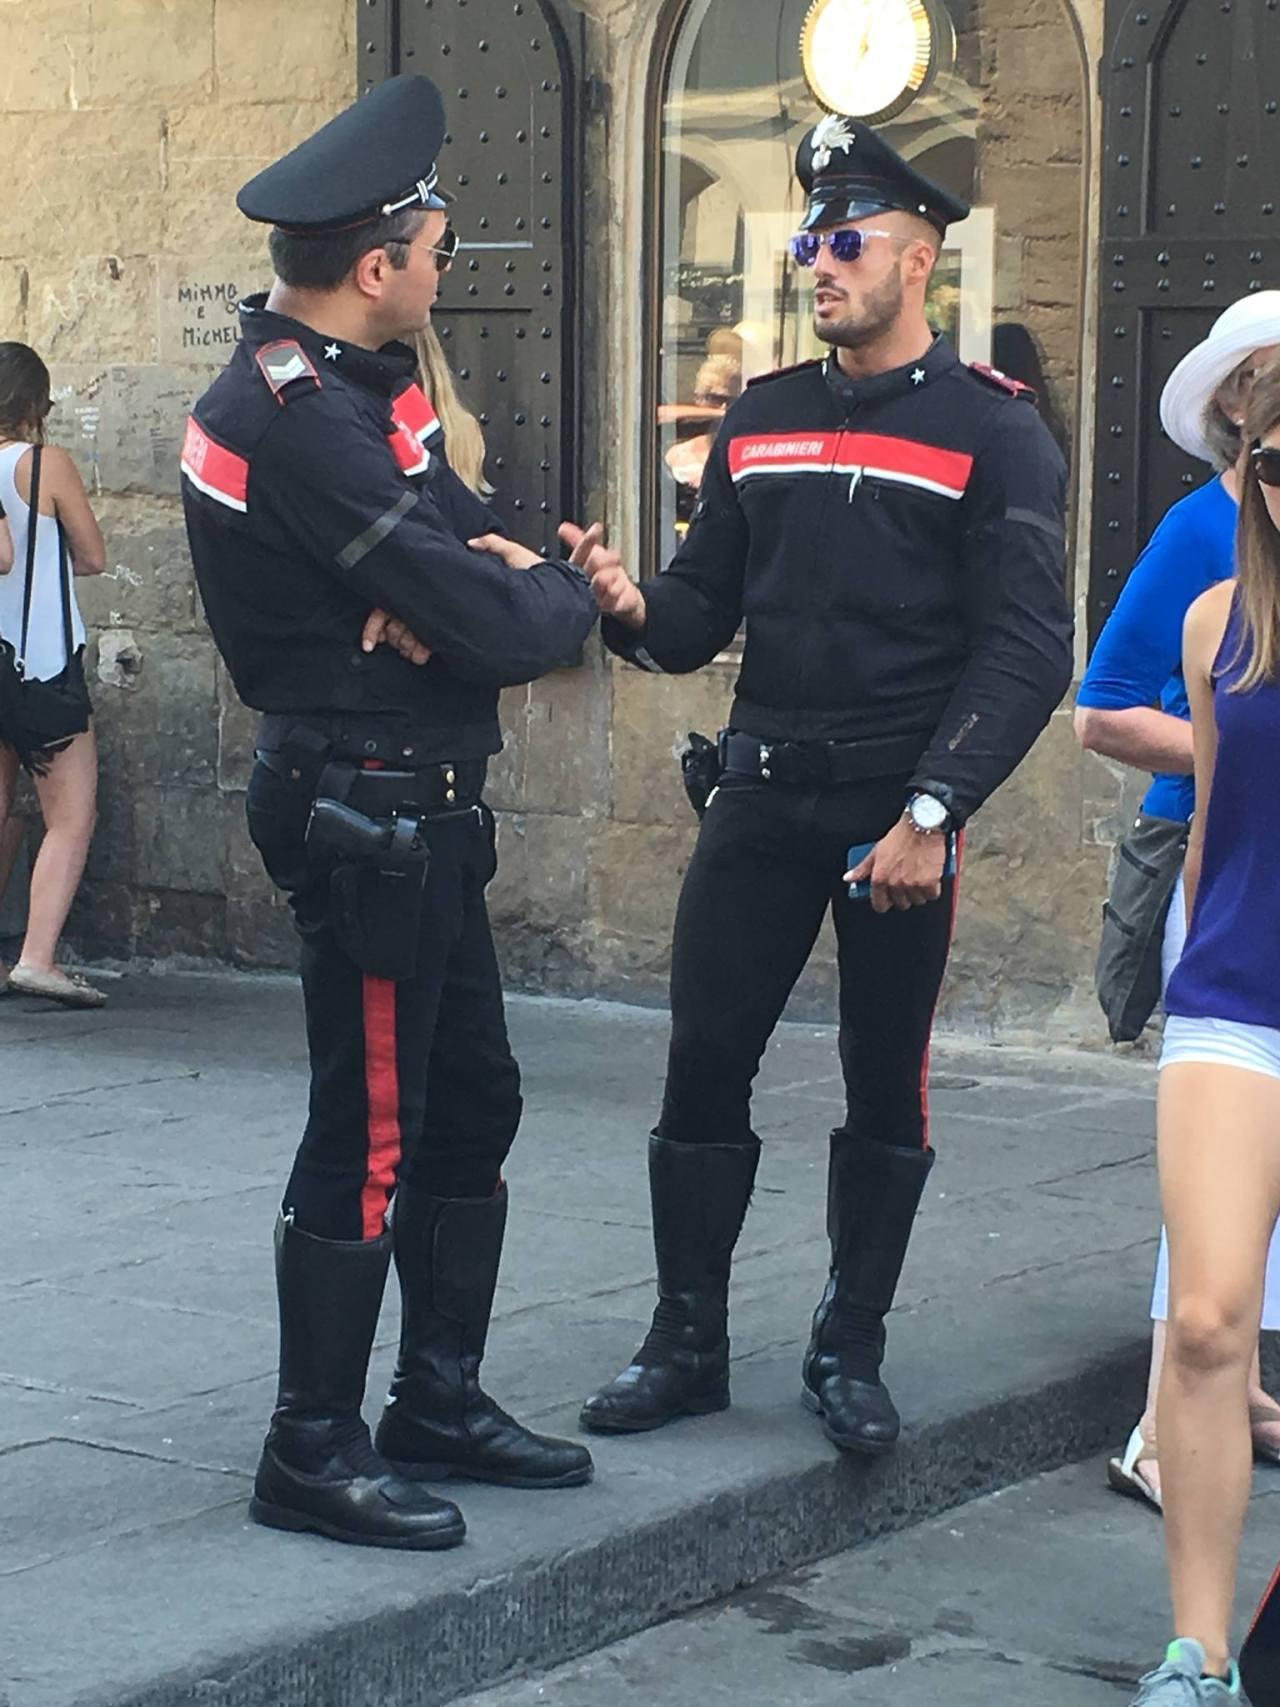 Hot Cops In Boots